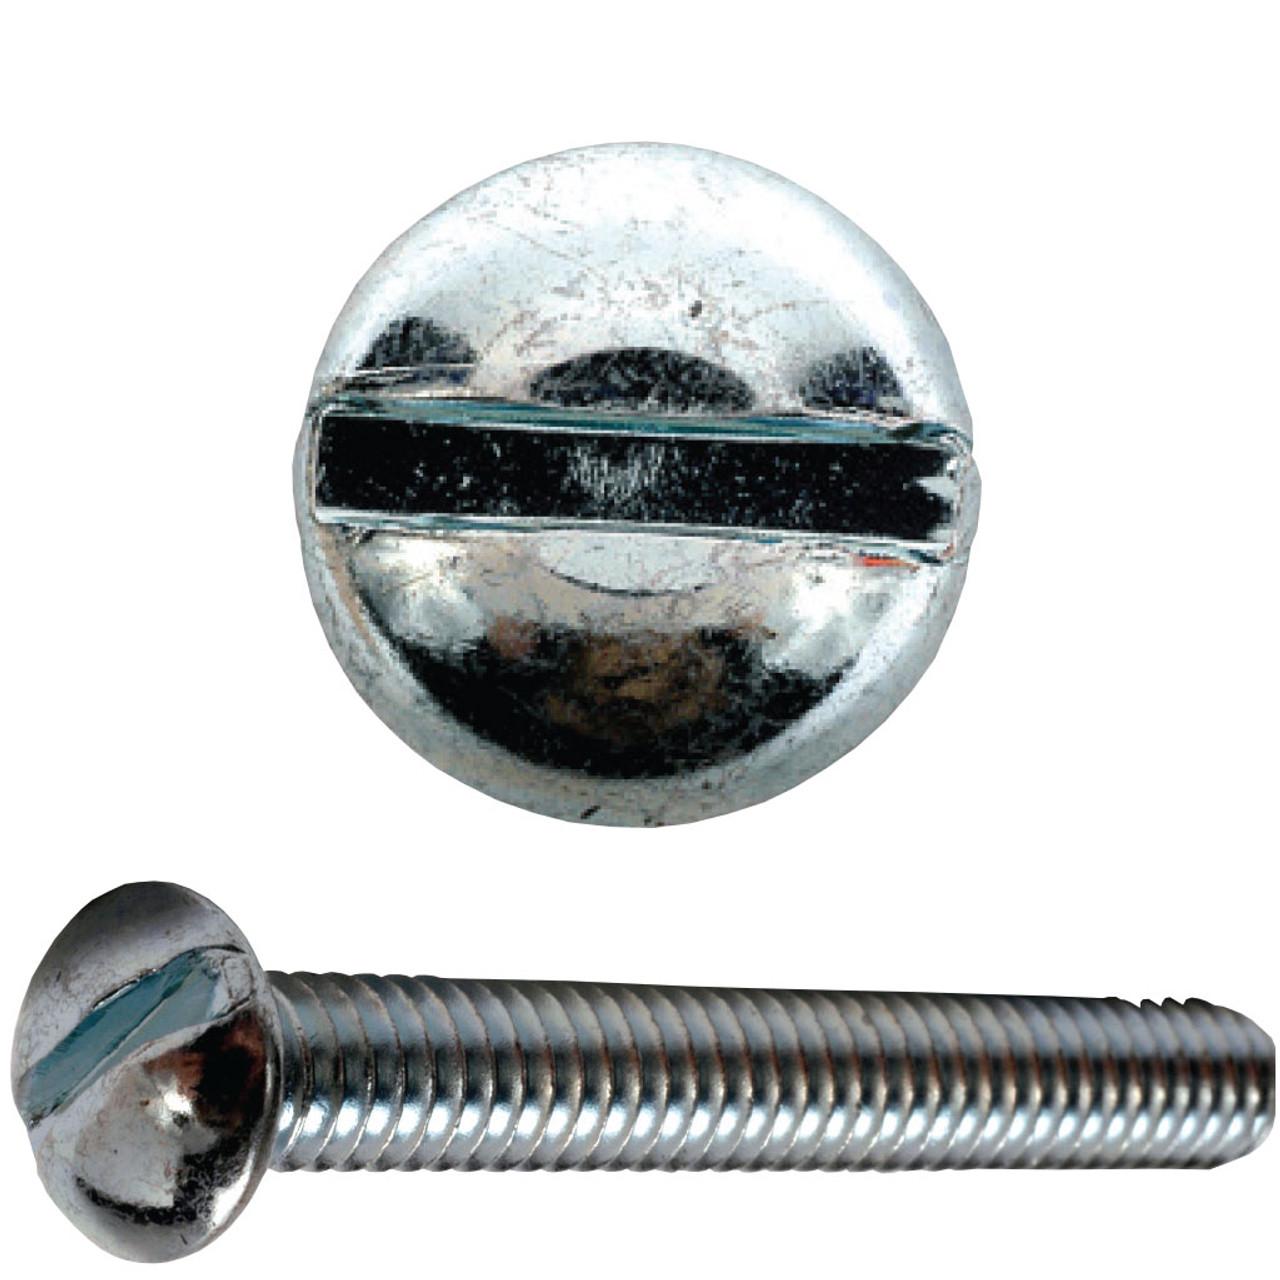 10-32 X 1 1//4 Slotted Round Machine Screw Brass Package Qty 100